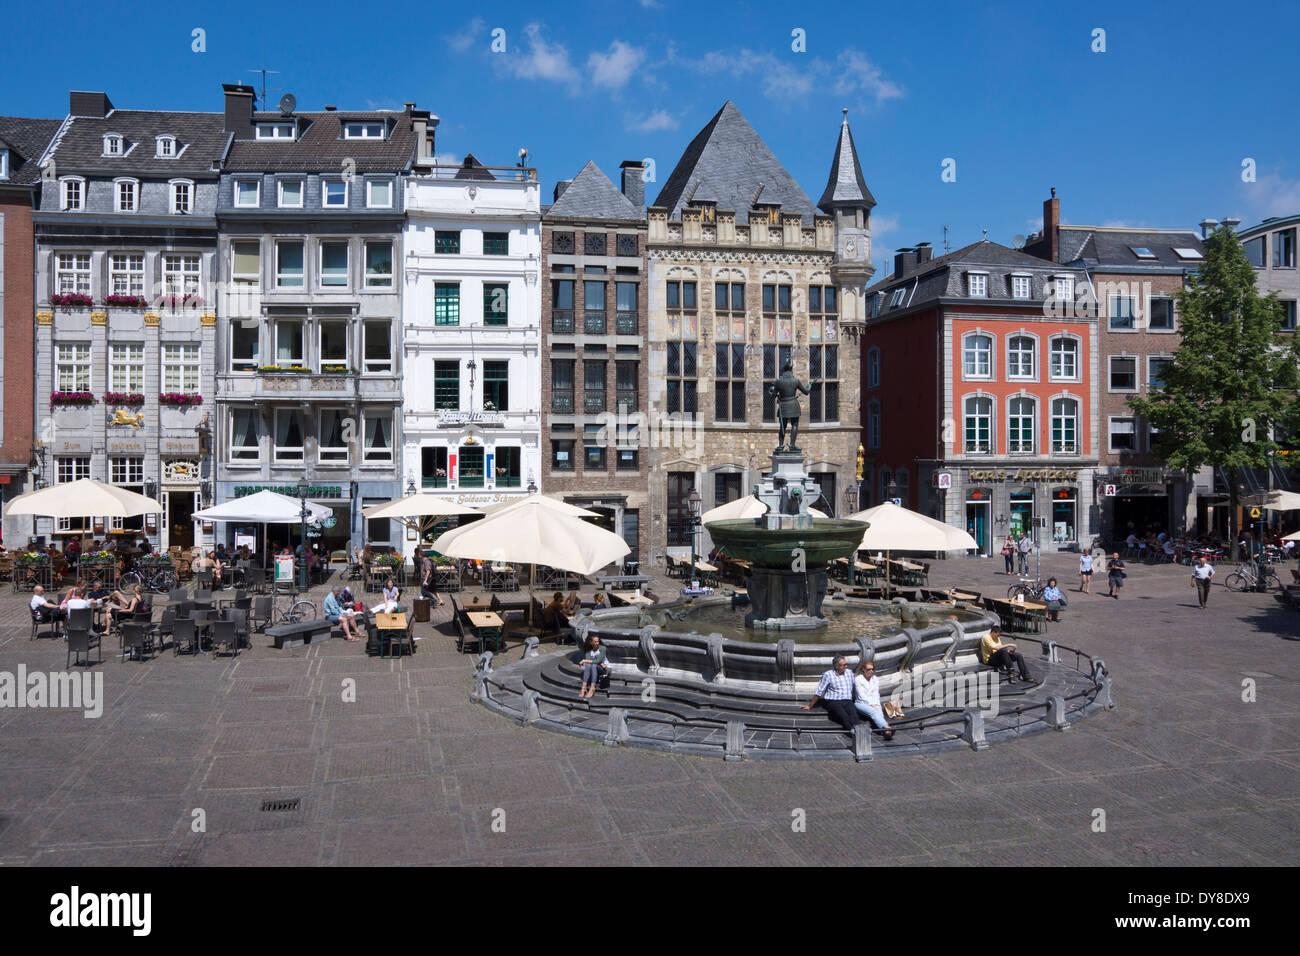 Market Square Aachen Stockfotos & Market Square Aachen